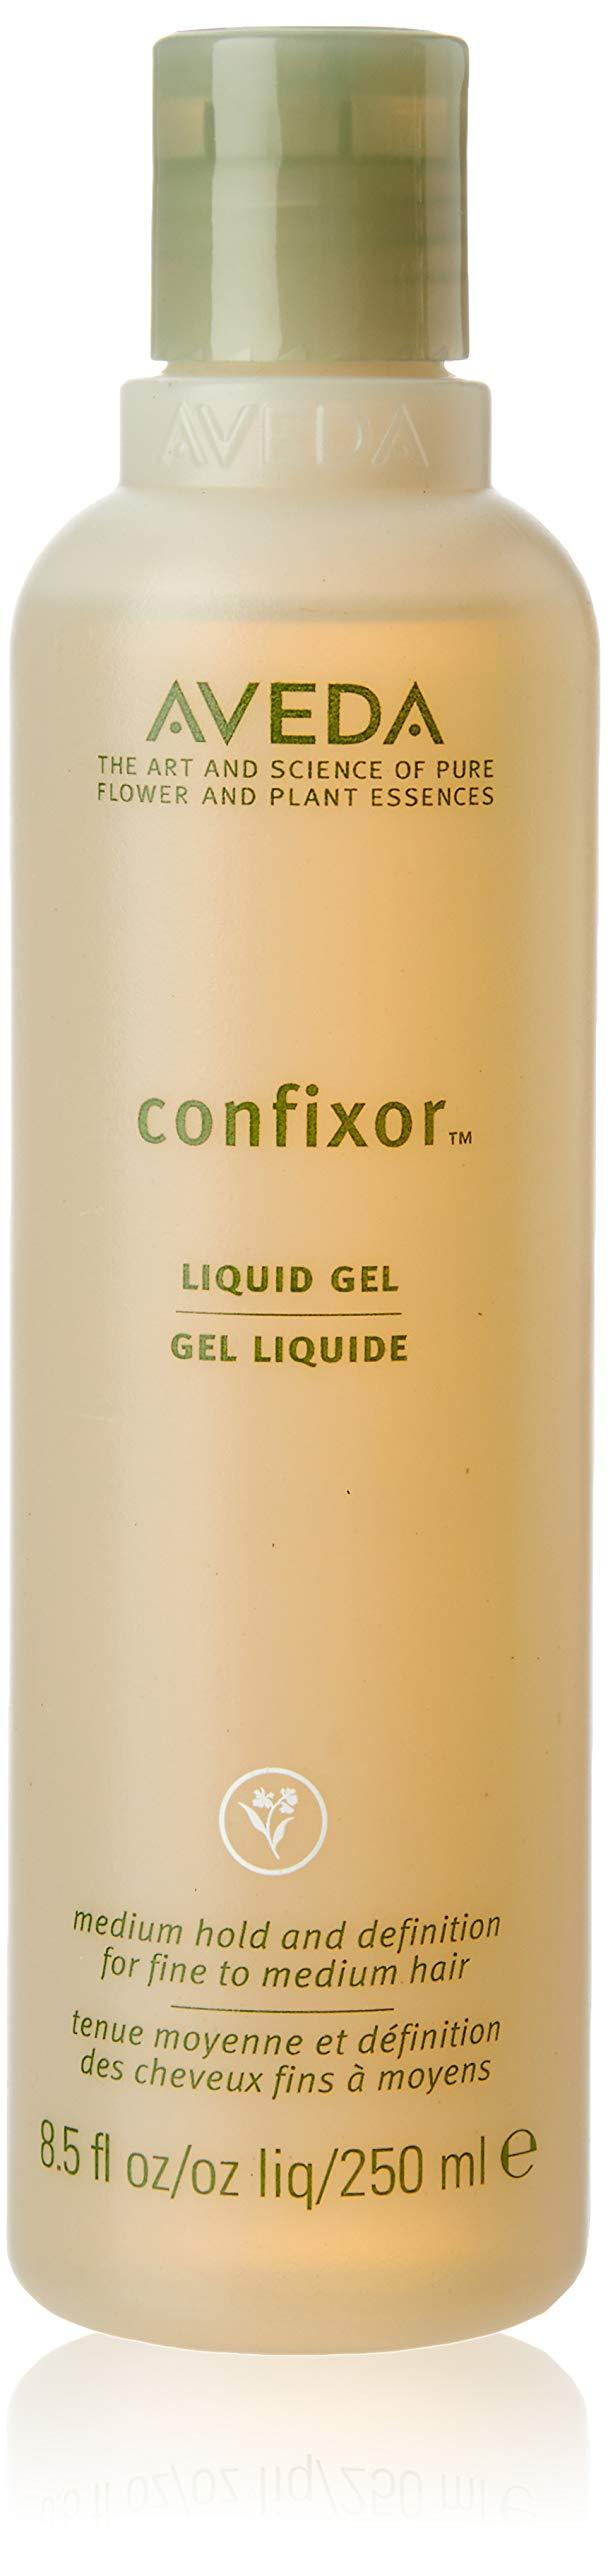 Aveda Confixor Liquid Gel, 8.5 Ounces